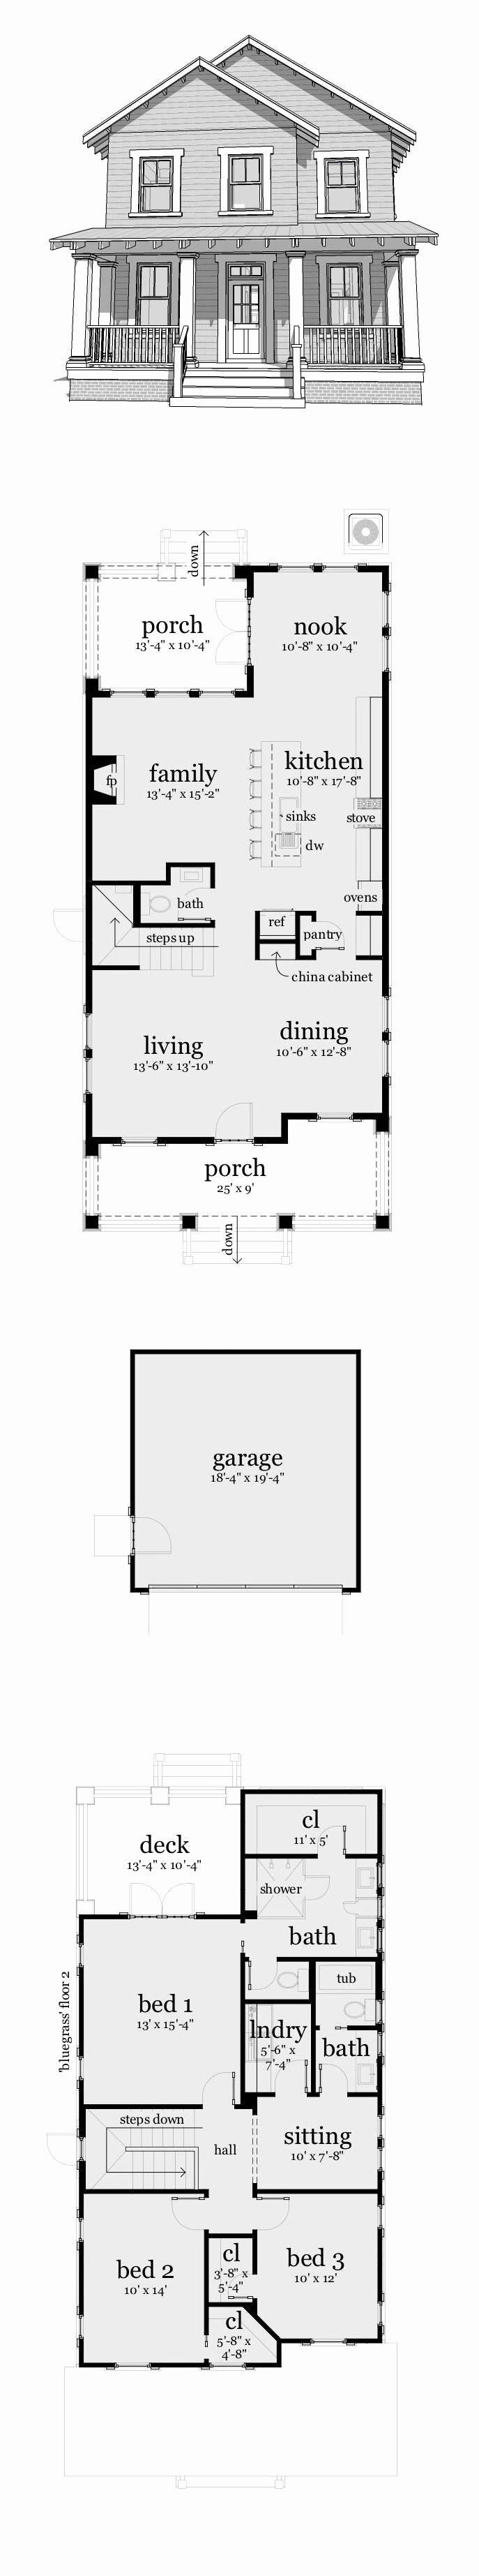 First Floor Master Bedroom Addition Plans Best